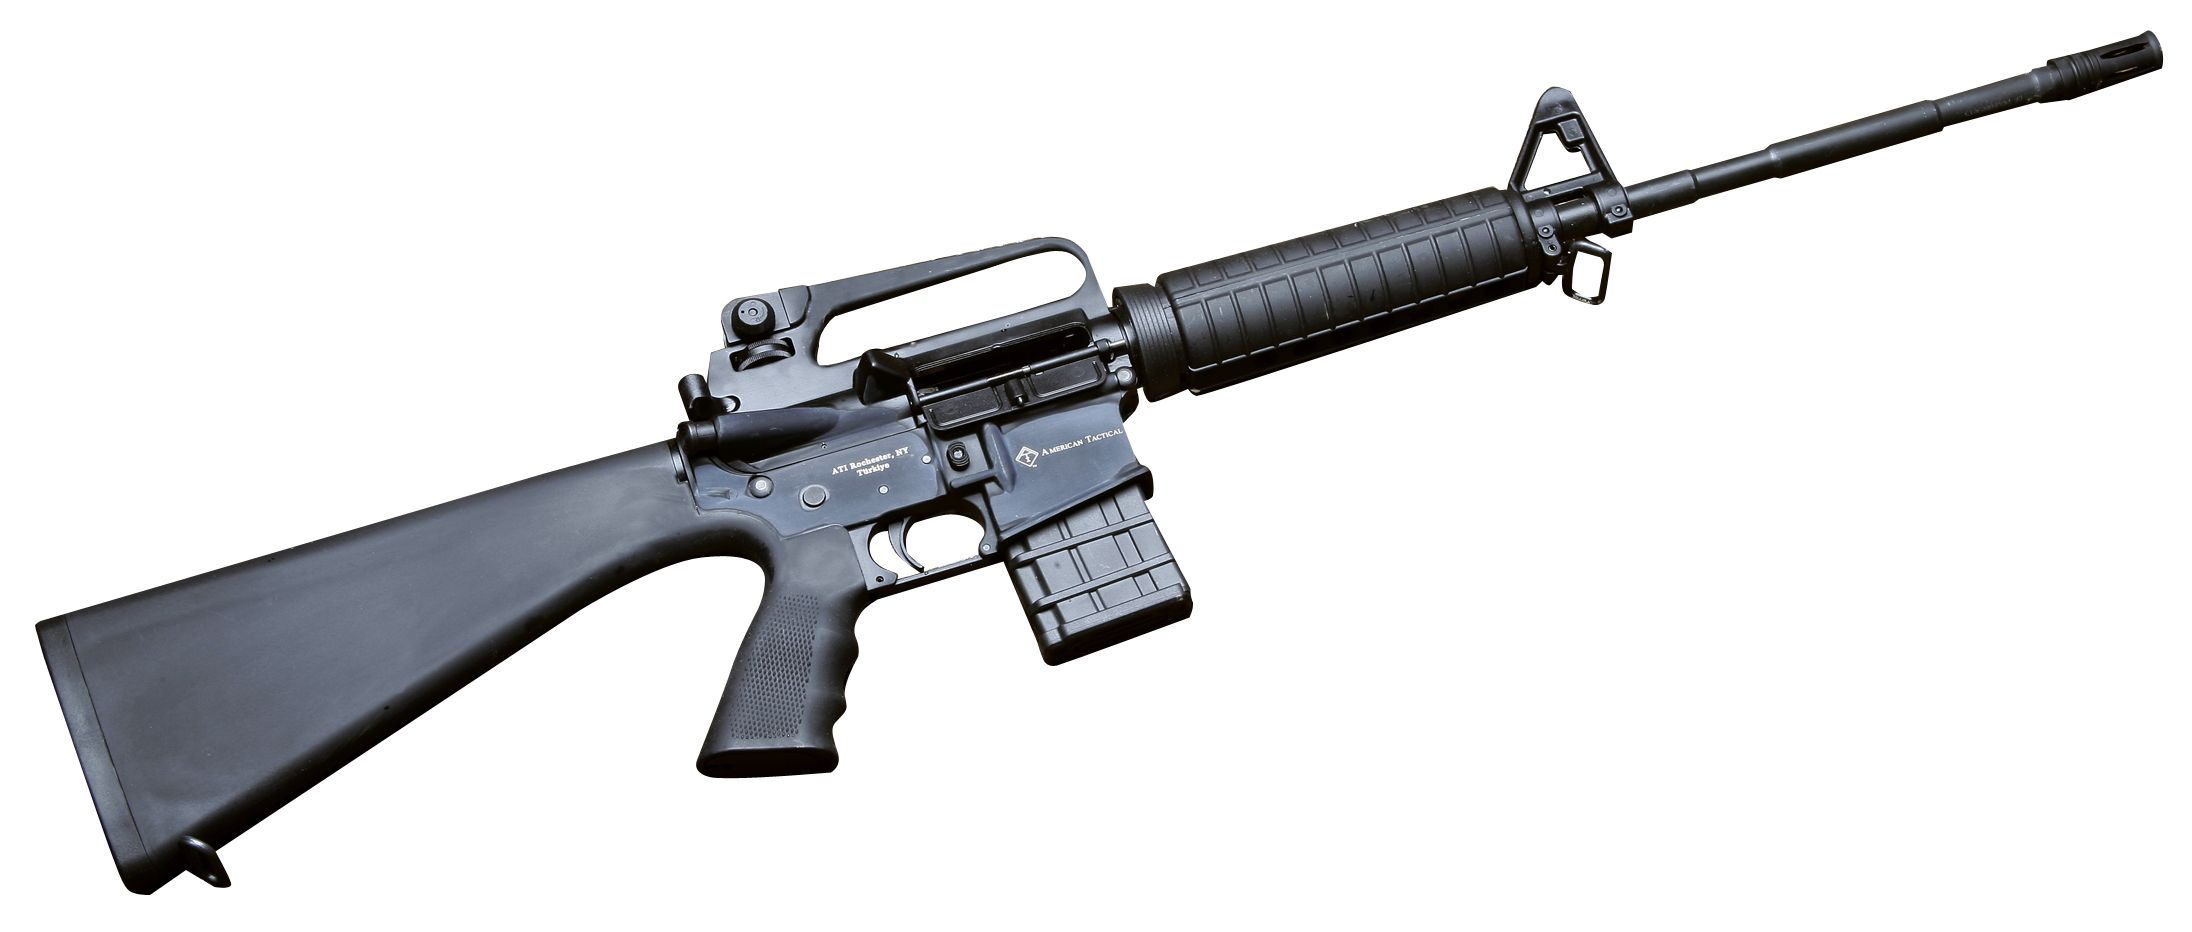 Saiga 20 Shotguns for Sale | ATI Announces New AR-Style 410